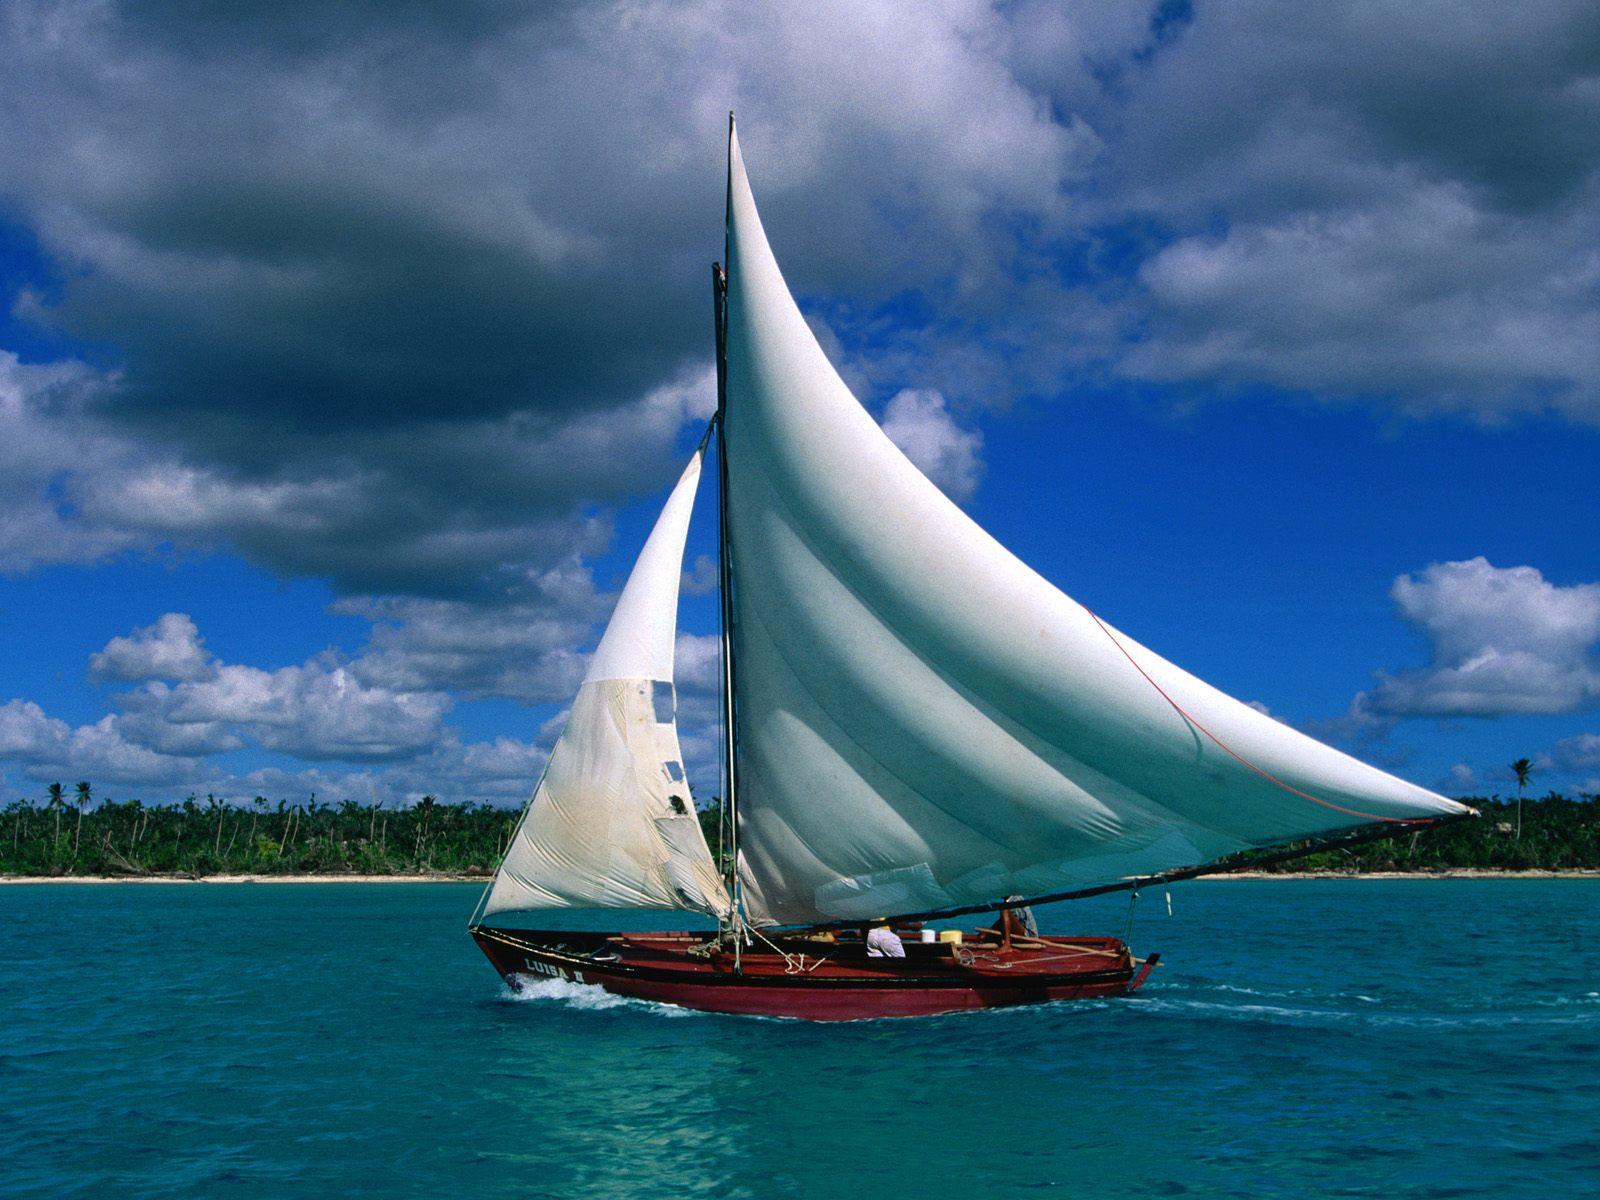 http://2.bp.blogspot.com/-HRVkY164vKk/Tv3ncW4KrfI/AAAAAAAADZI/Xo4Vhz461yg/s1600/Fishing+Sailboat%252C+Bayahibe%252C+La+Romana%252C+Dominican+Republic.jpg